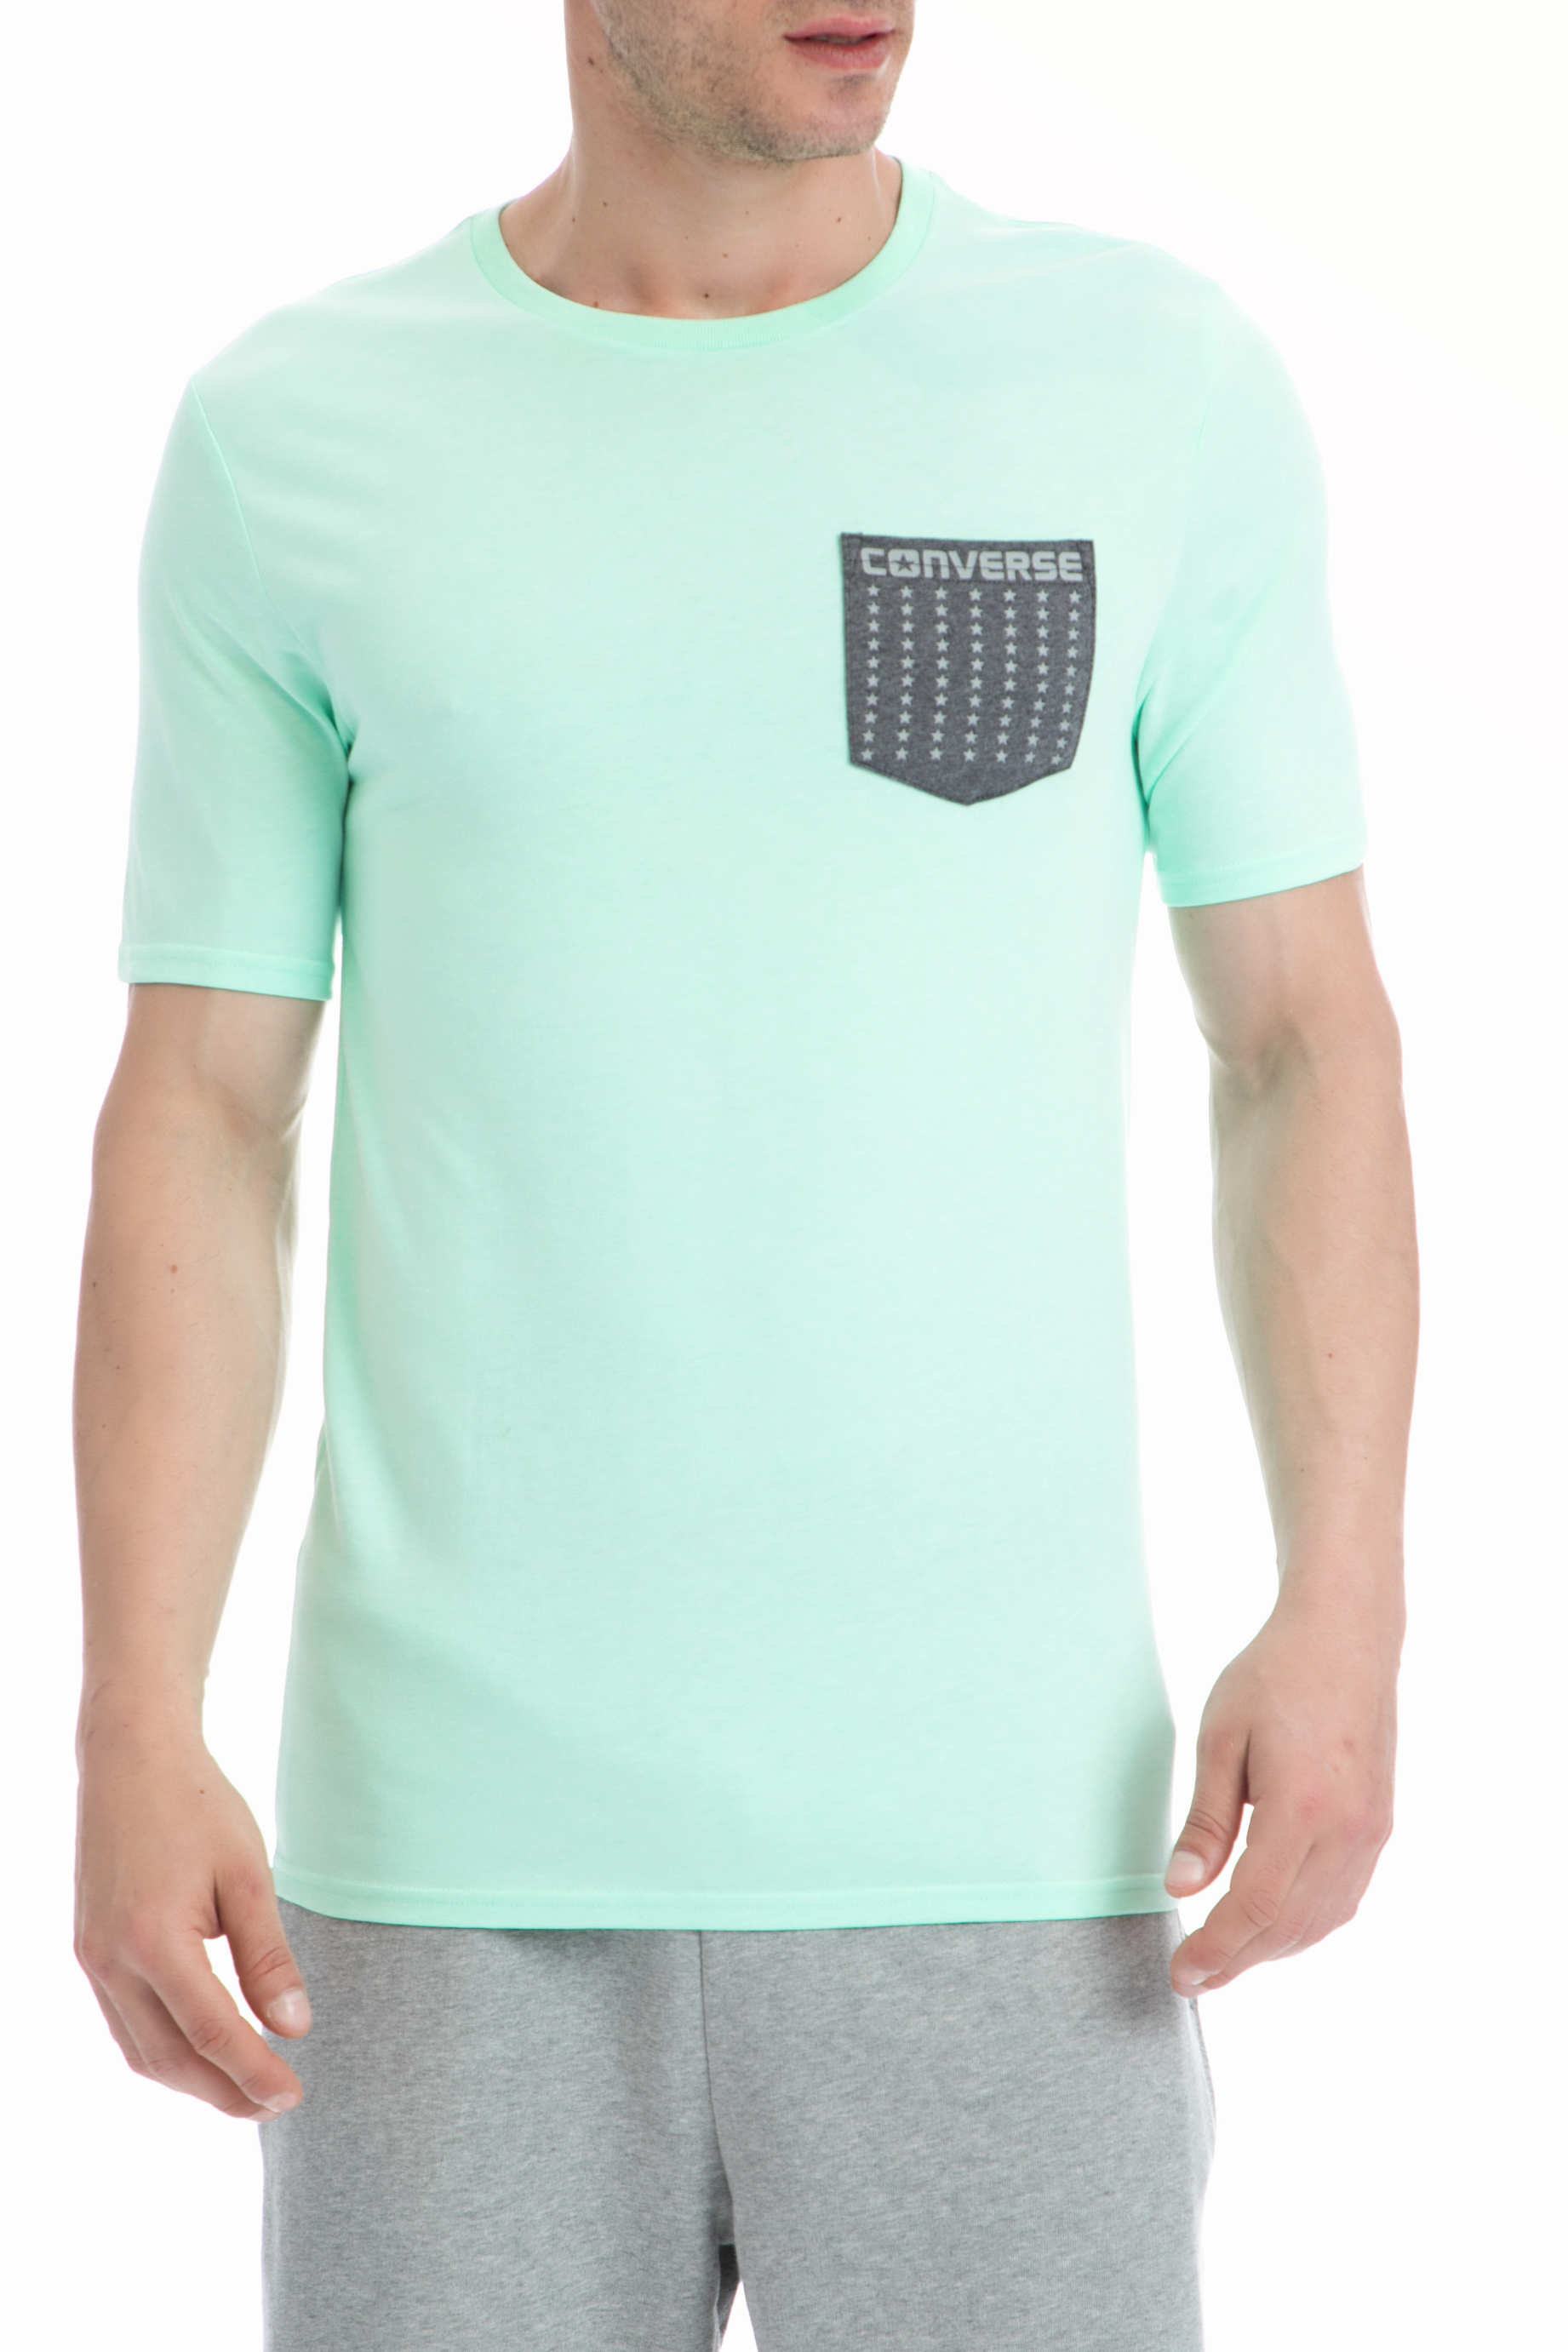 CONVERSE - Ανδρική μπλούζα Converse πράσινη ανδρικά ρούχα αθλητικά t shirt